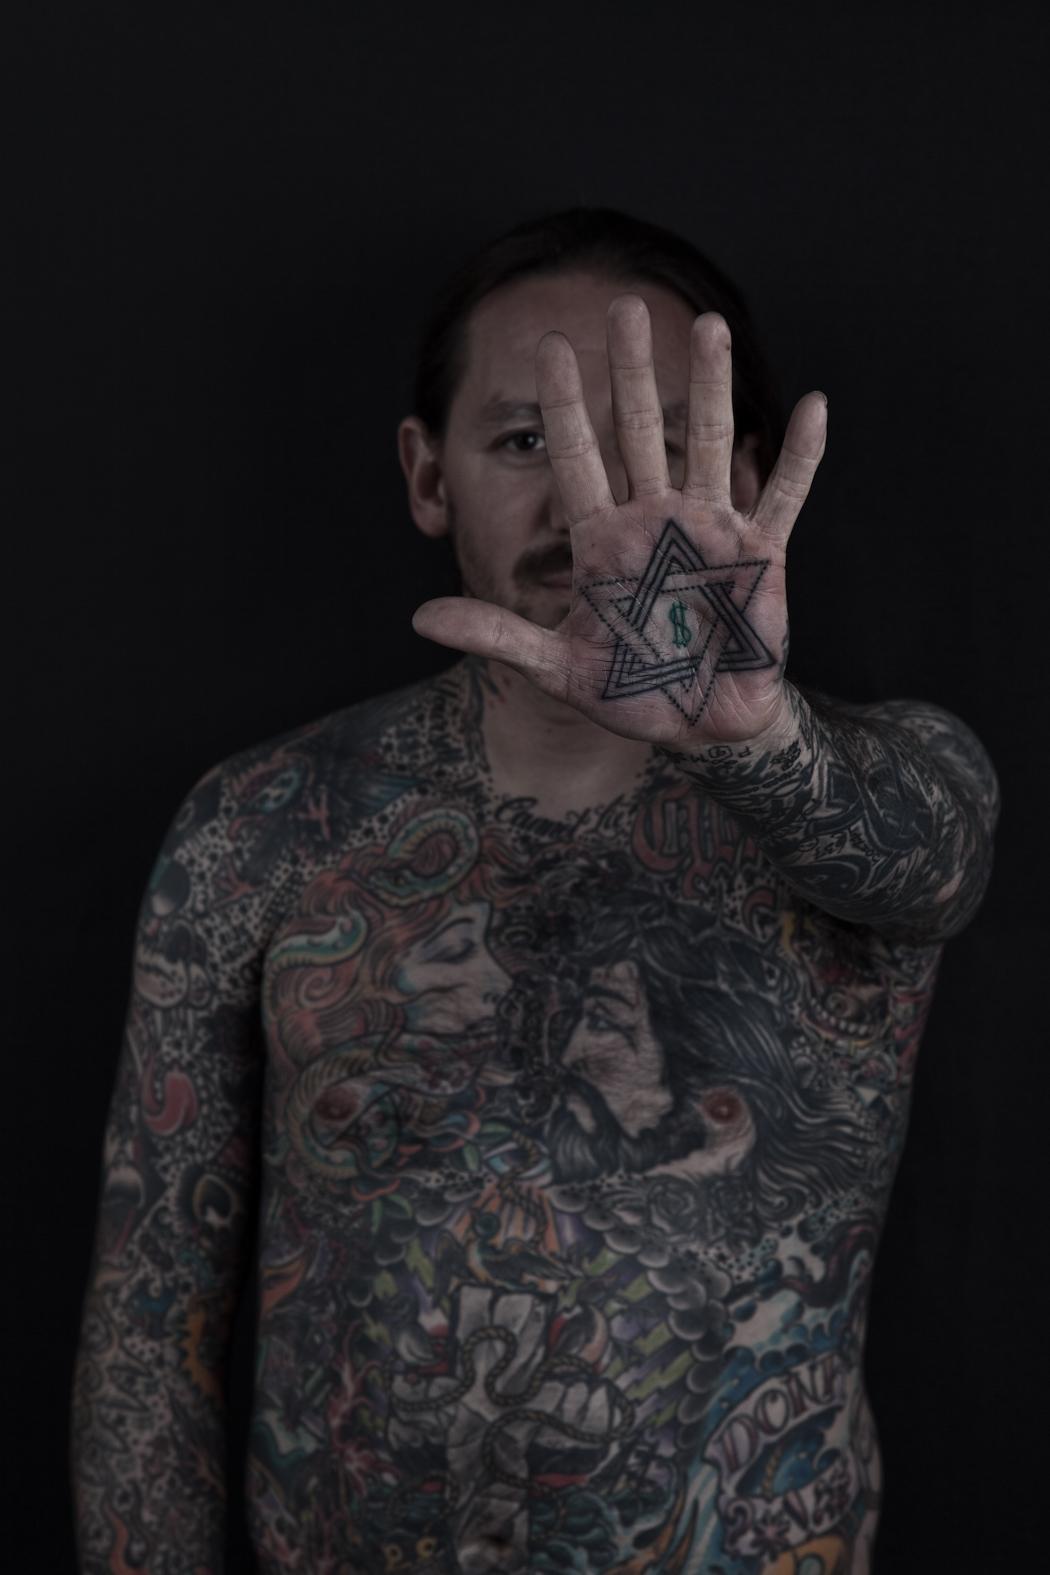 Quality Tattoos 5555 Responses